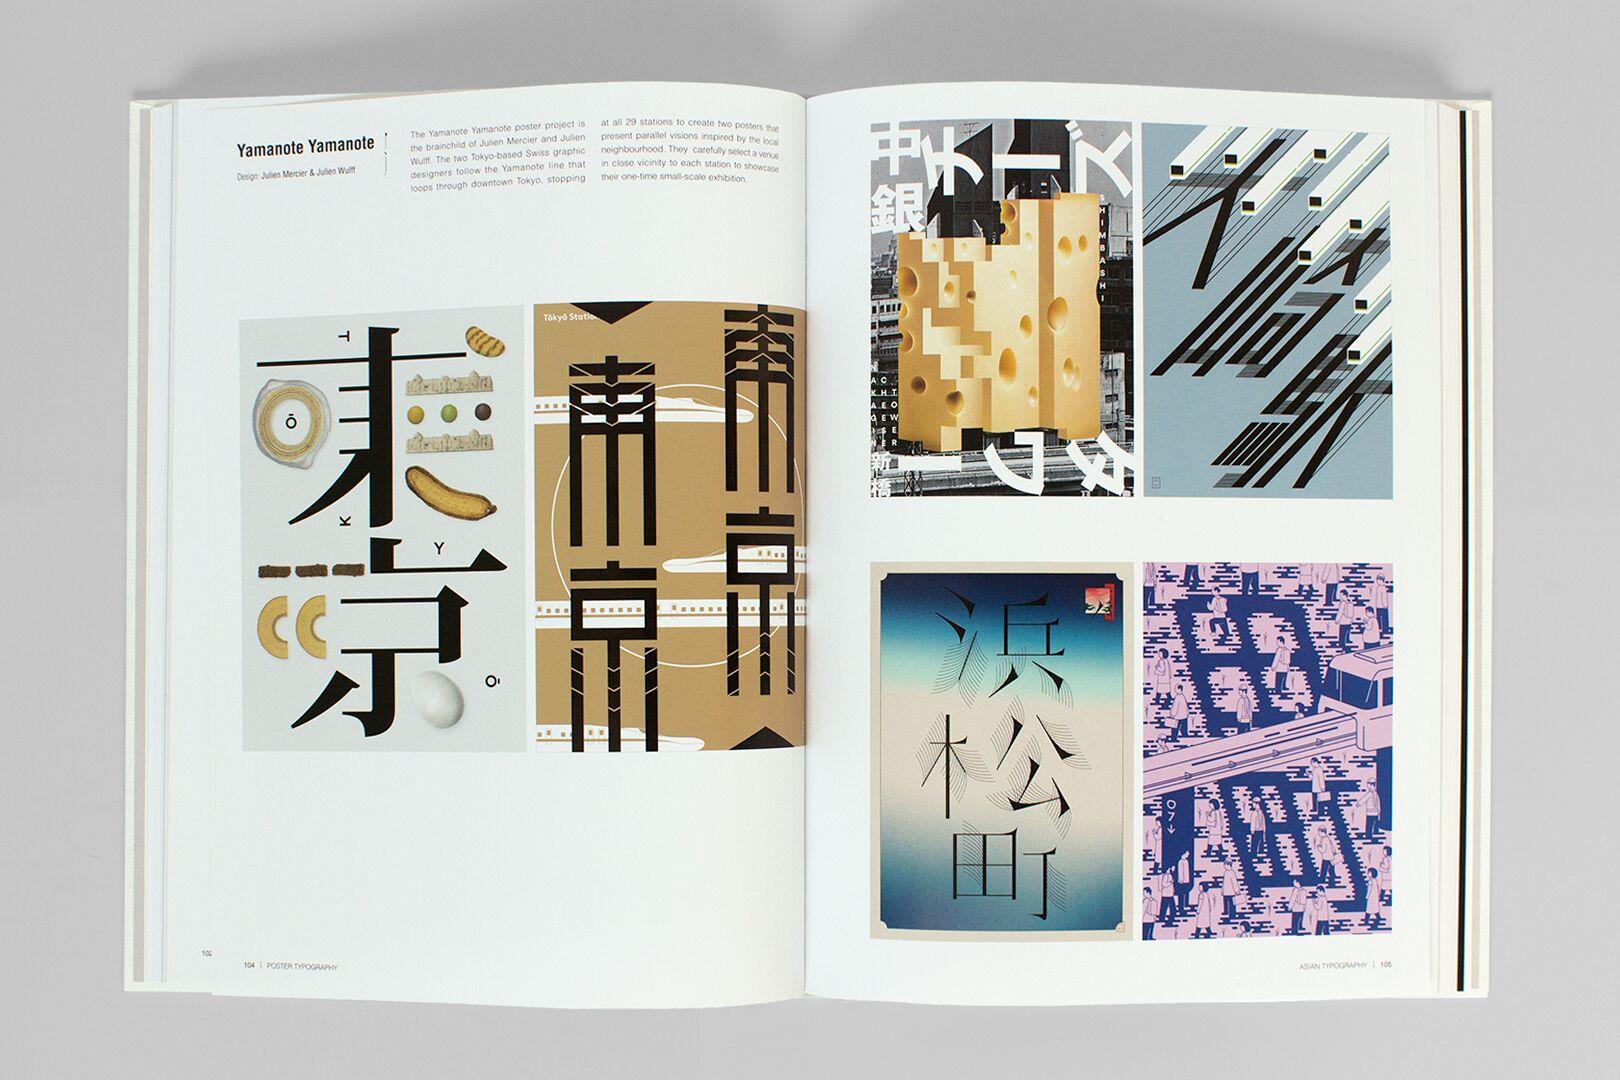 yamanoteyamanote sandu publishing asian typography hongkong asia swiss graphic design japan design yamanoteyamanote